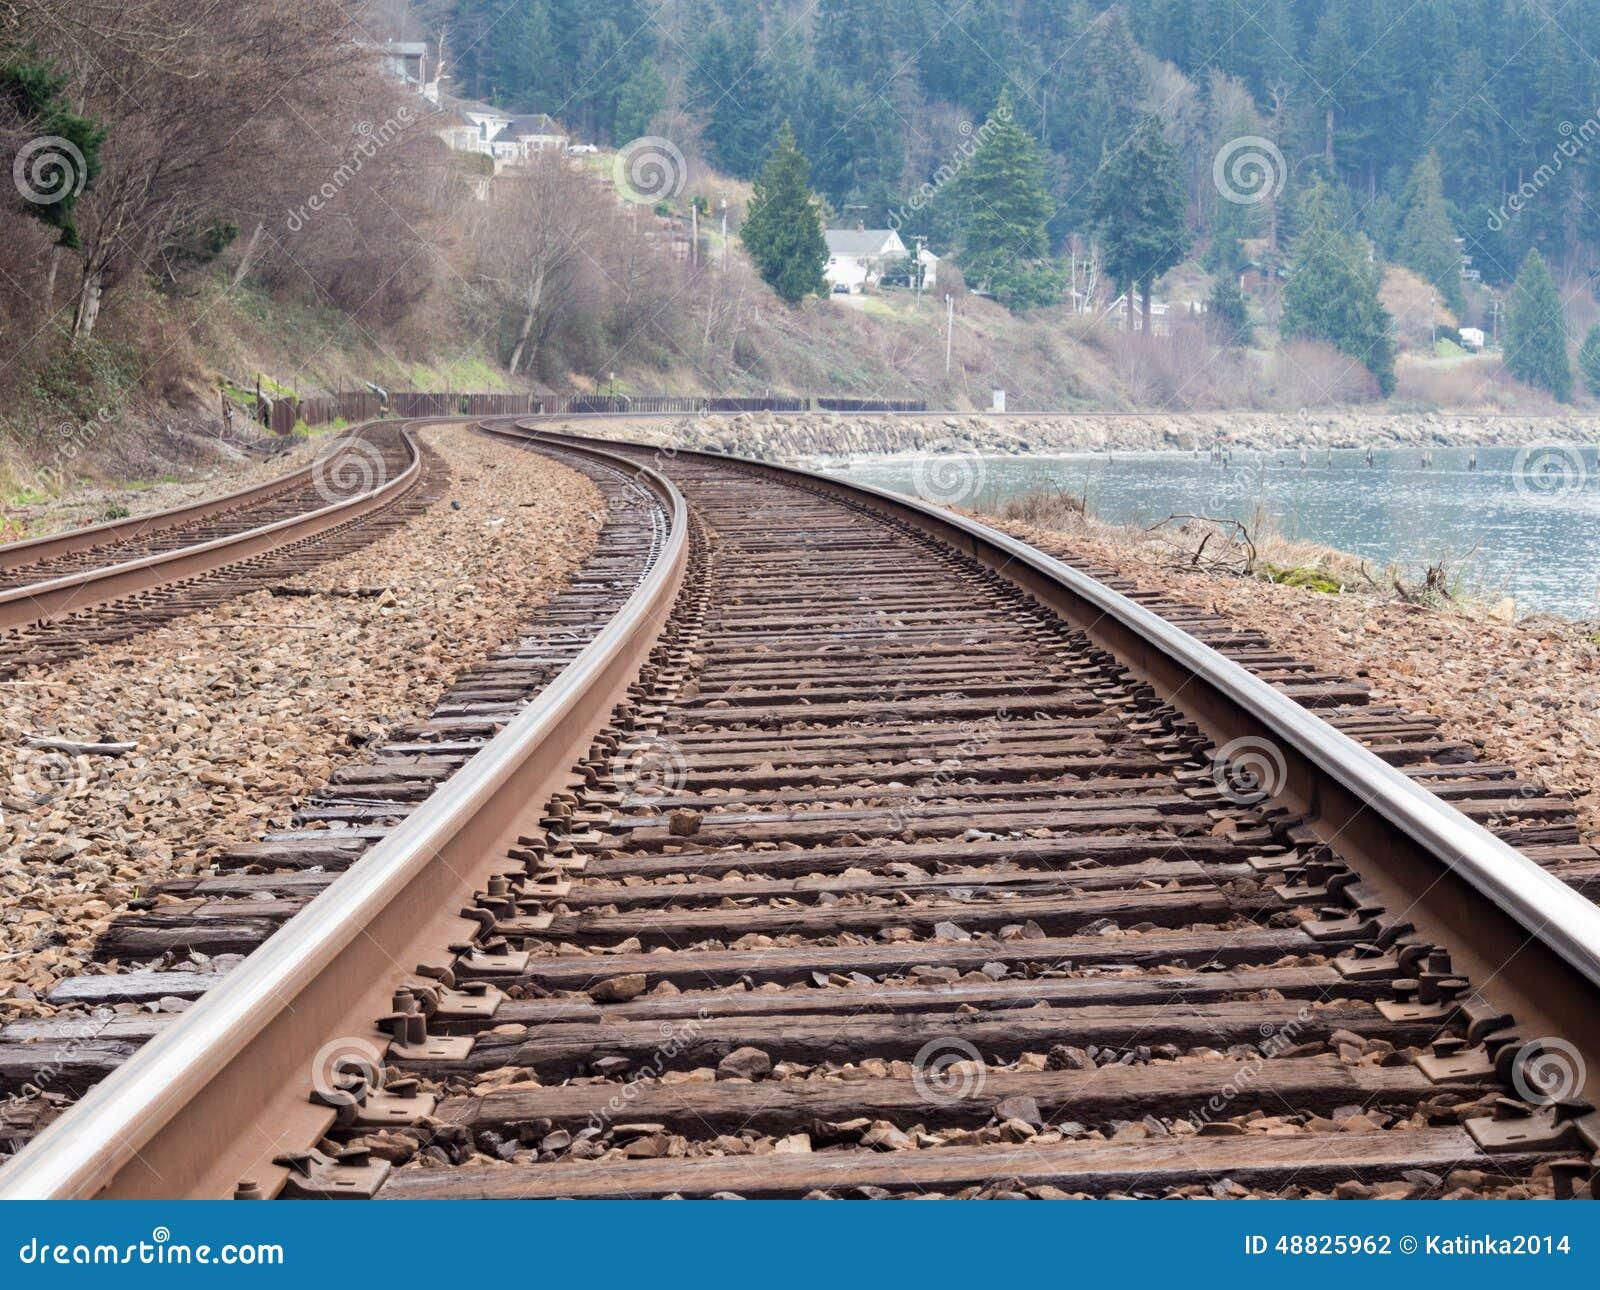 Railroad tracks along the ocean shore